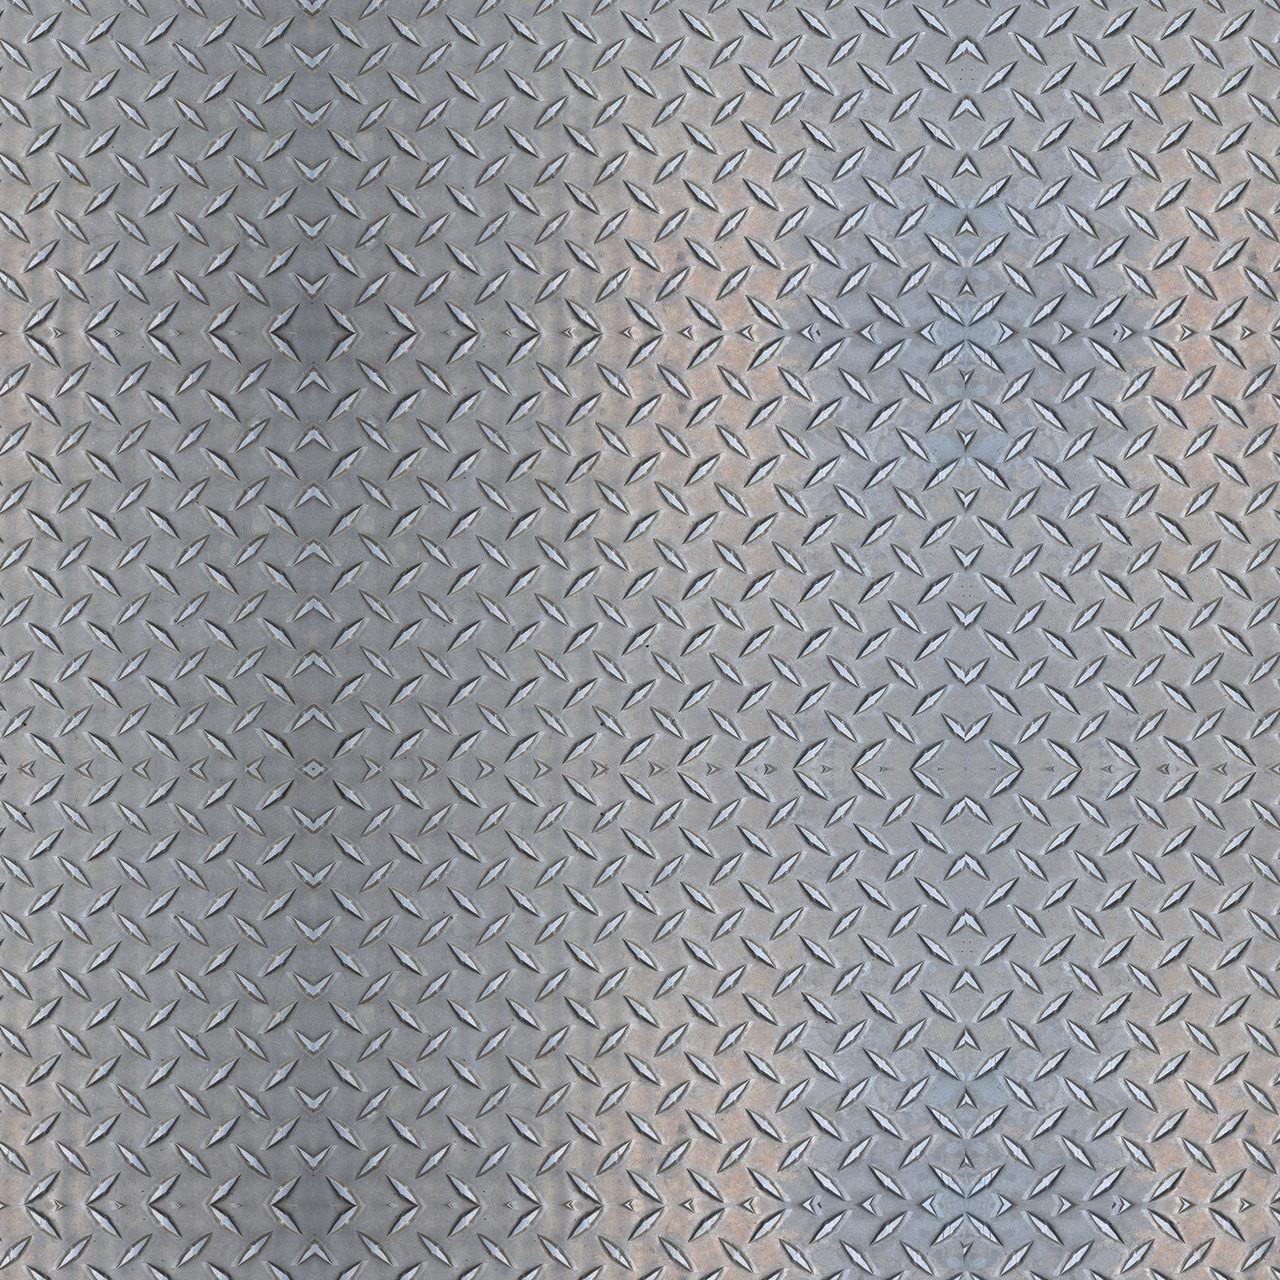 Rv Siding Jayco Skylark Fuse Box Location Aluminum Diamond Plate